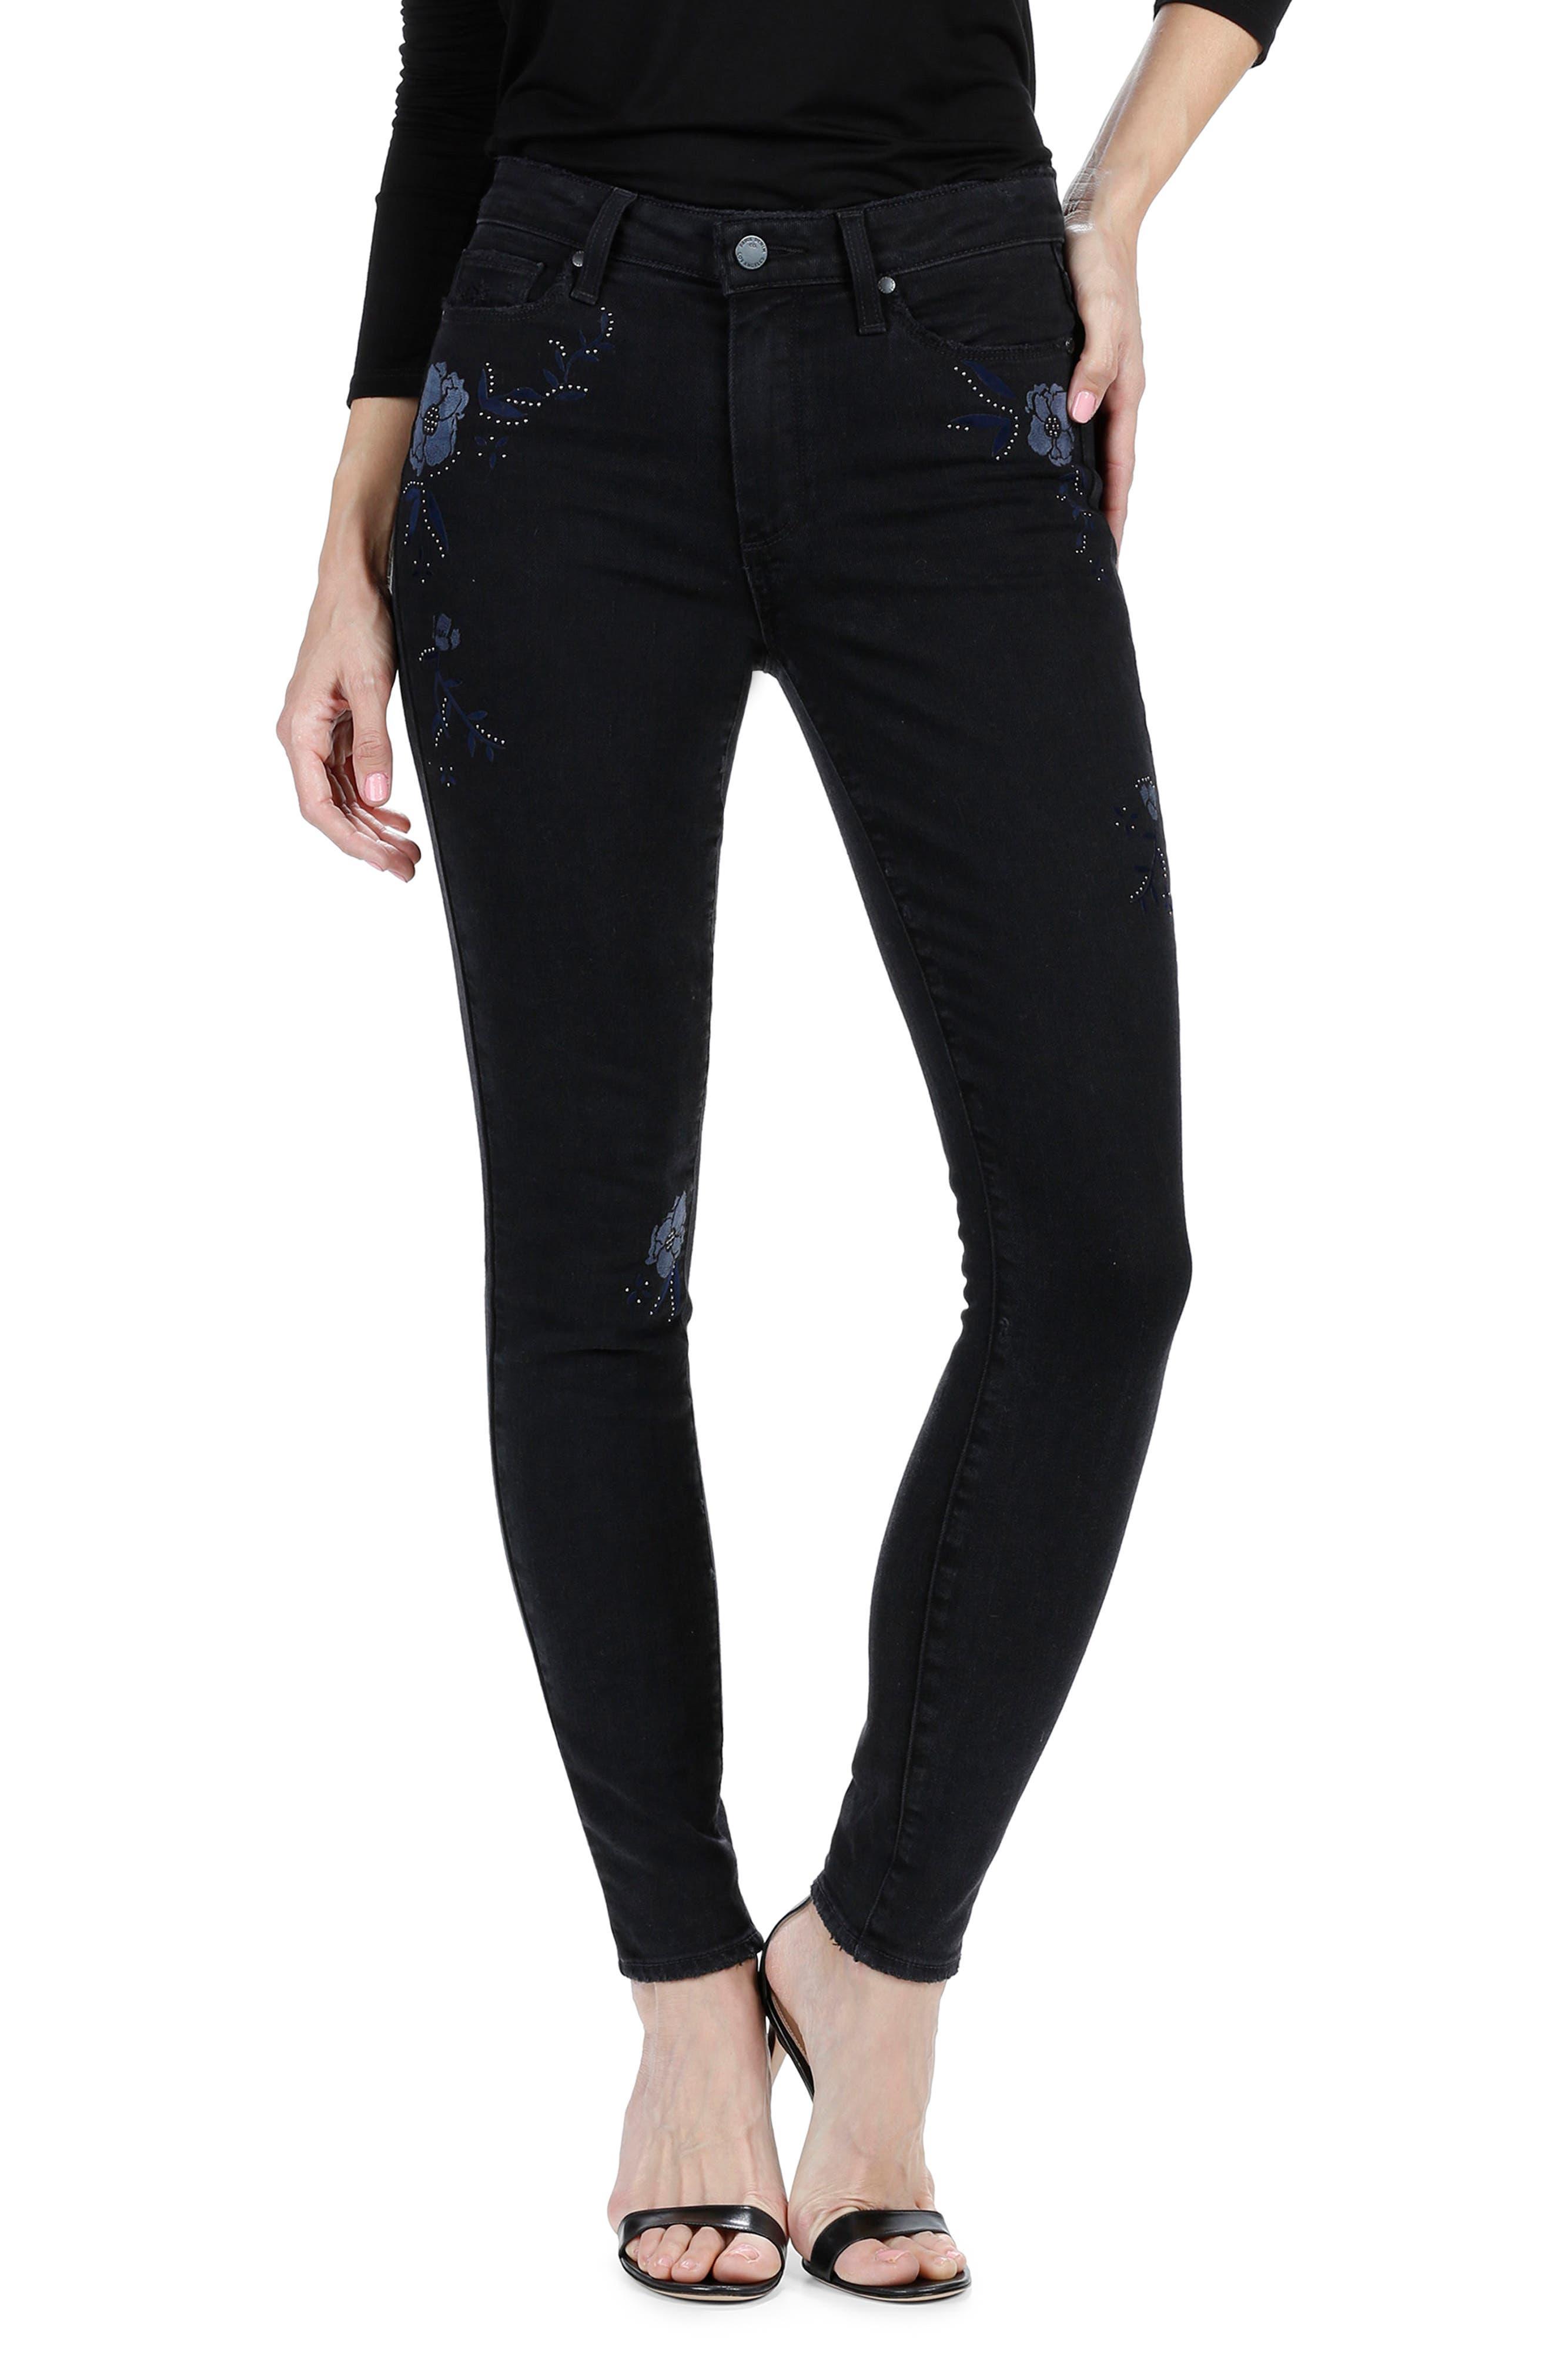 Hoxton High Waist Ultra Skinny Jeans,                         Main,                         color, Floral Noir